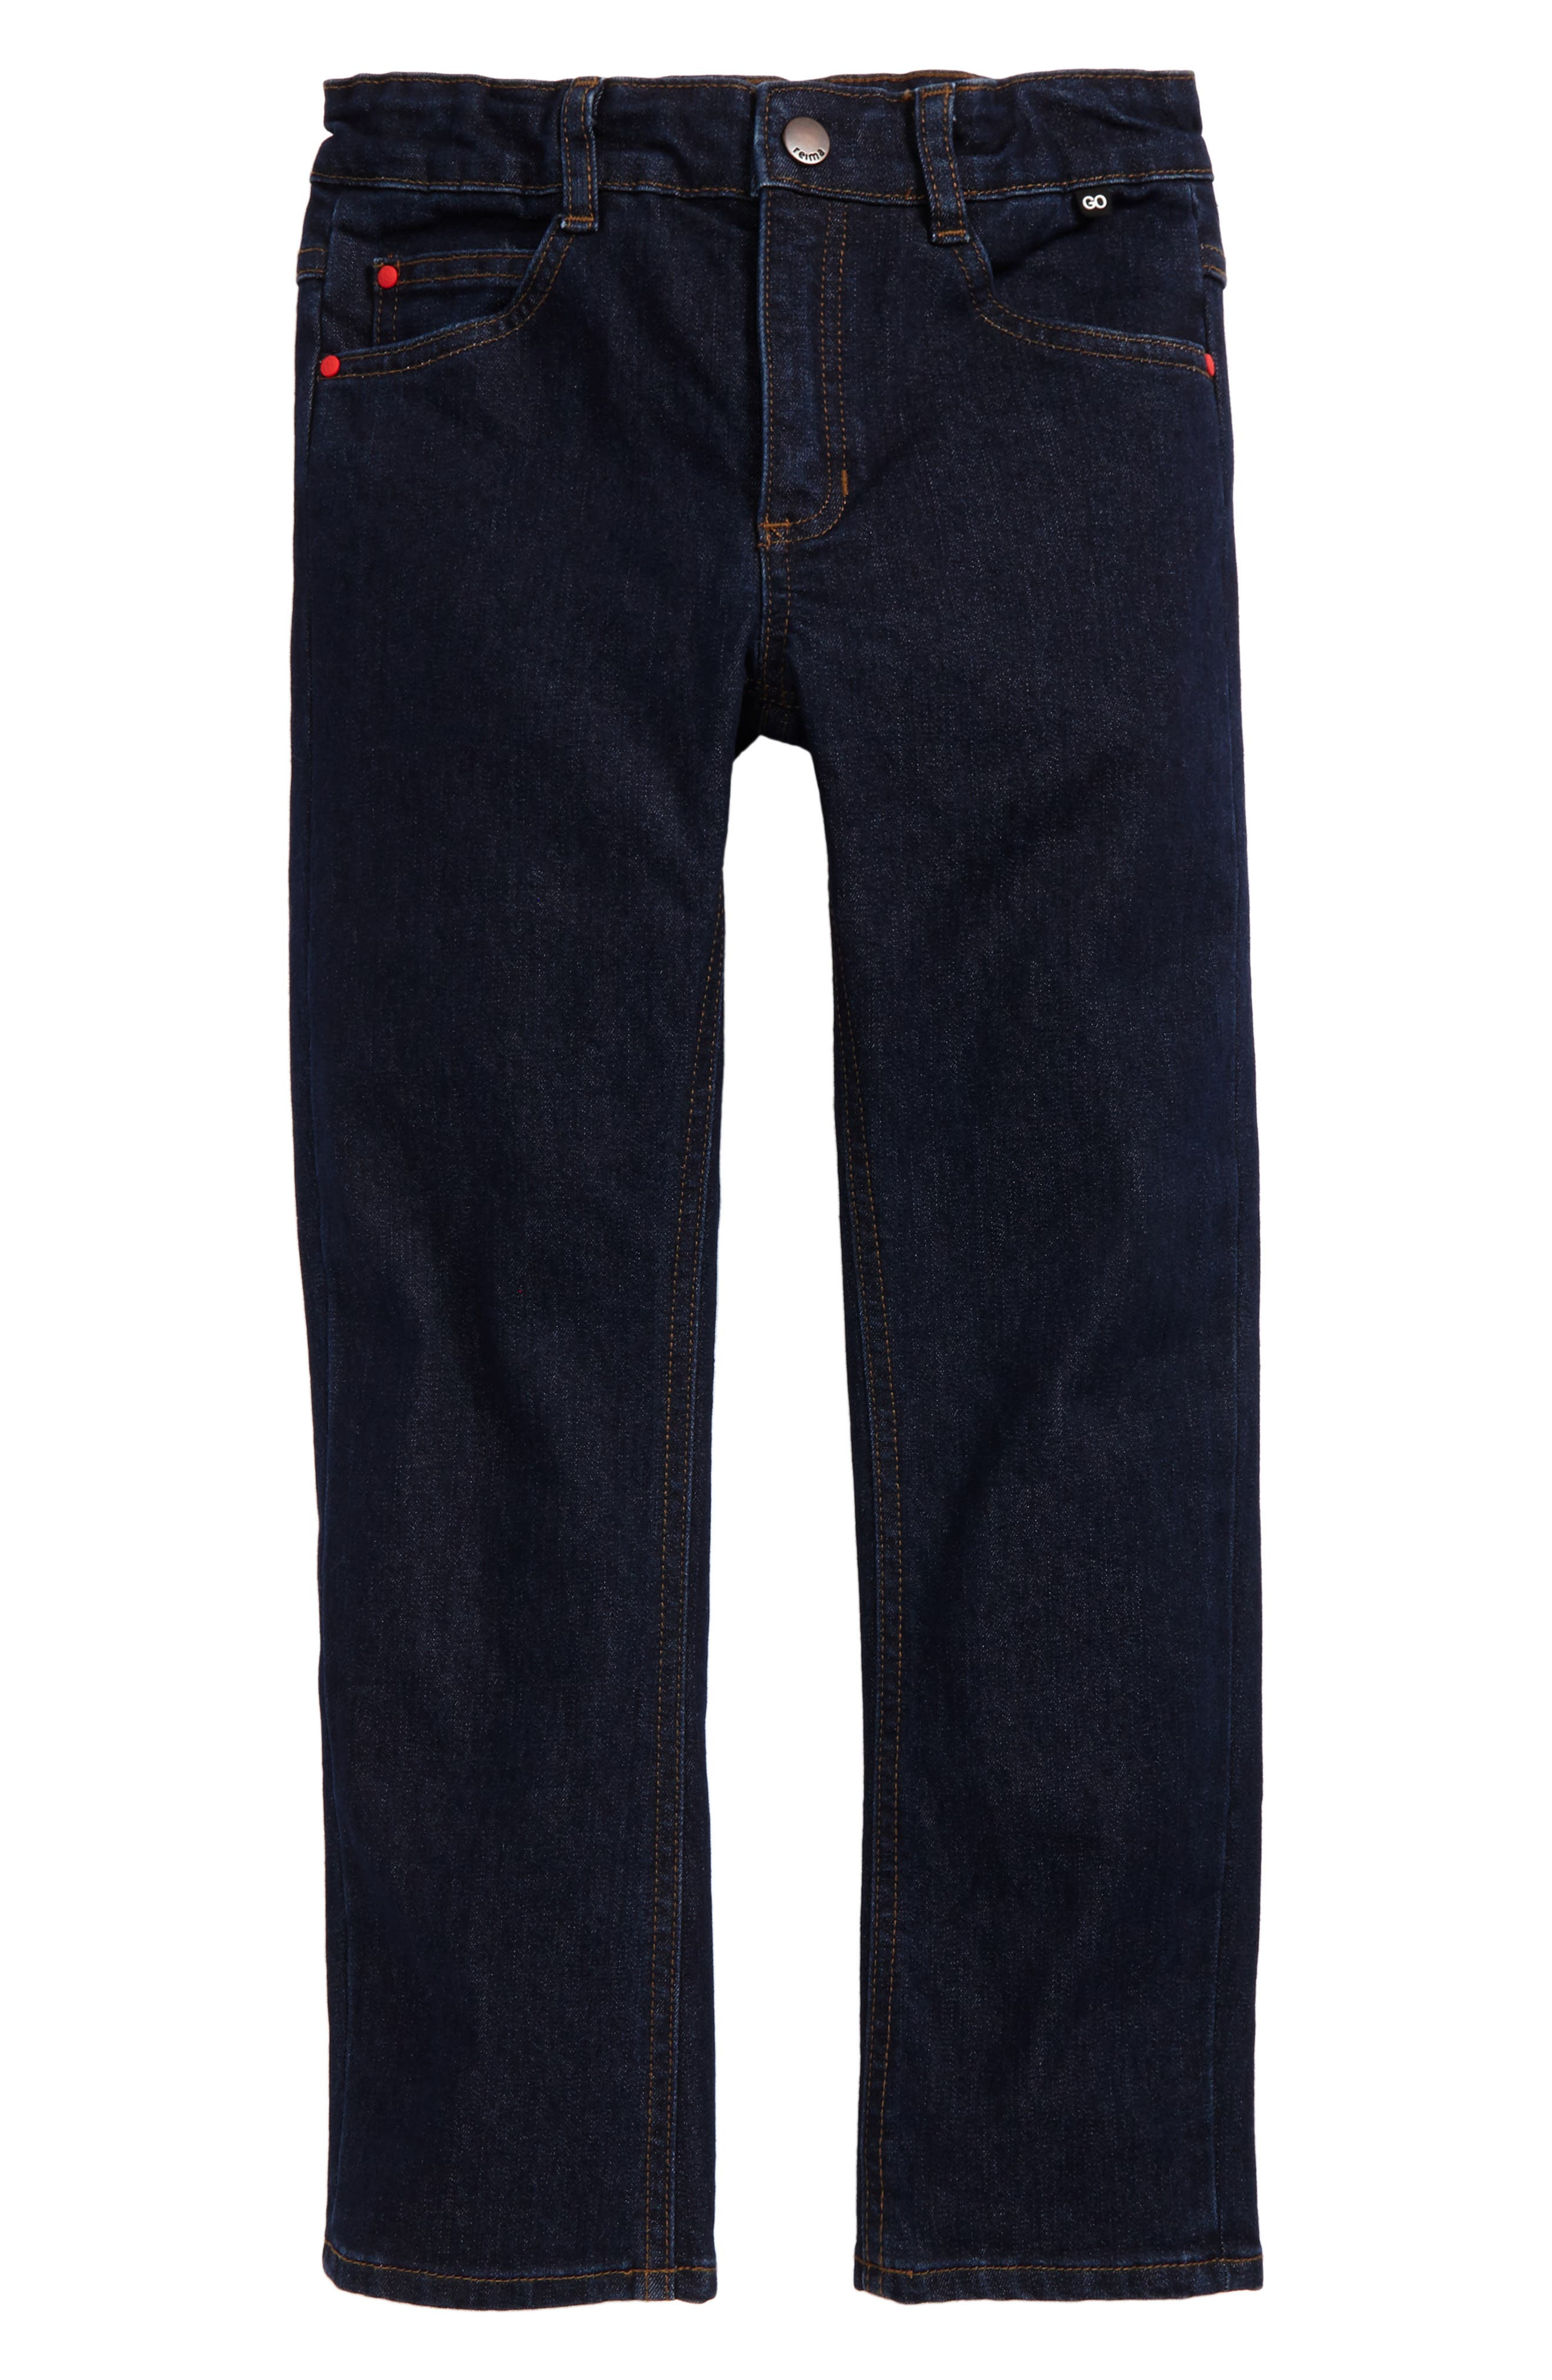 Trick Straight Leg Jeans,                         Main,                         color, 400